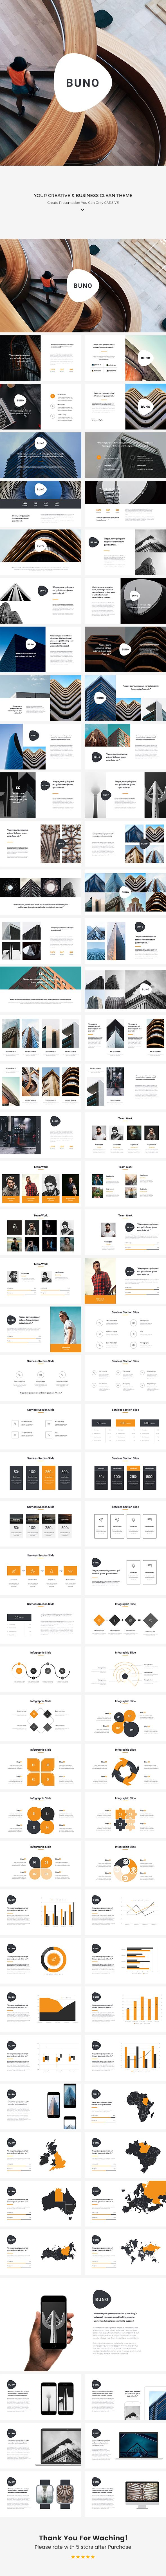 Buno Clean Keynote Template - 700+ Editable Icons